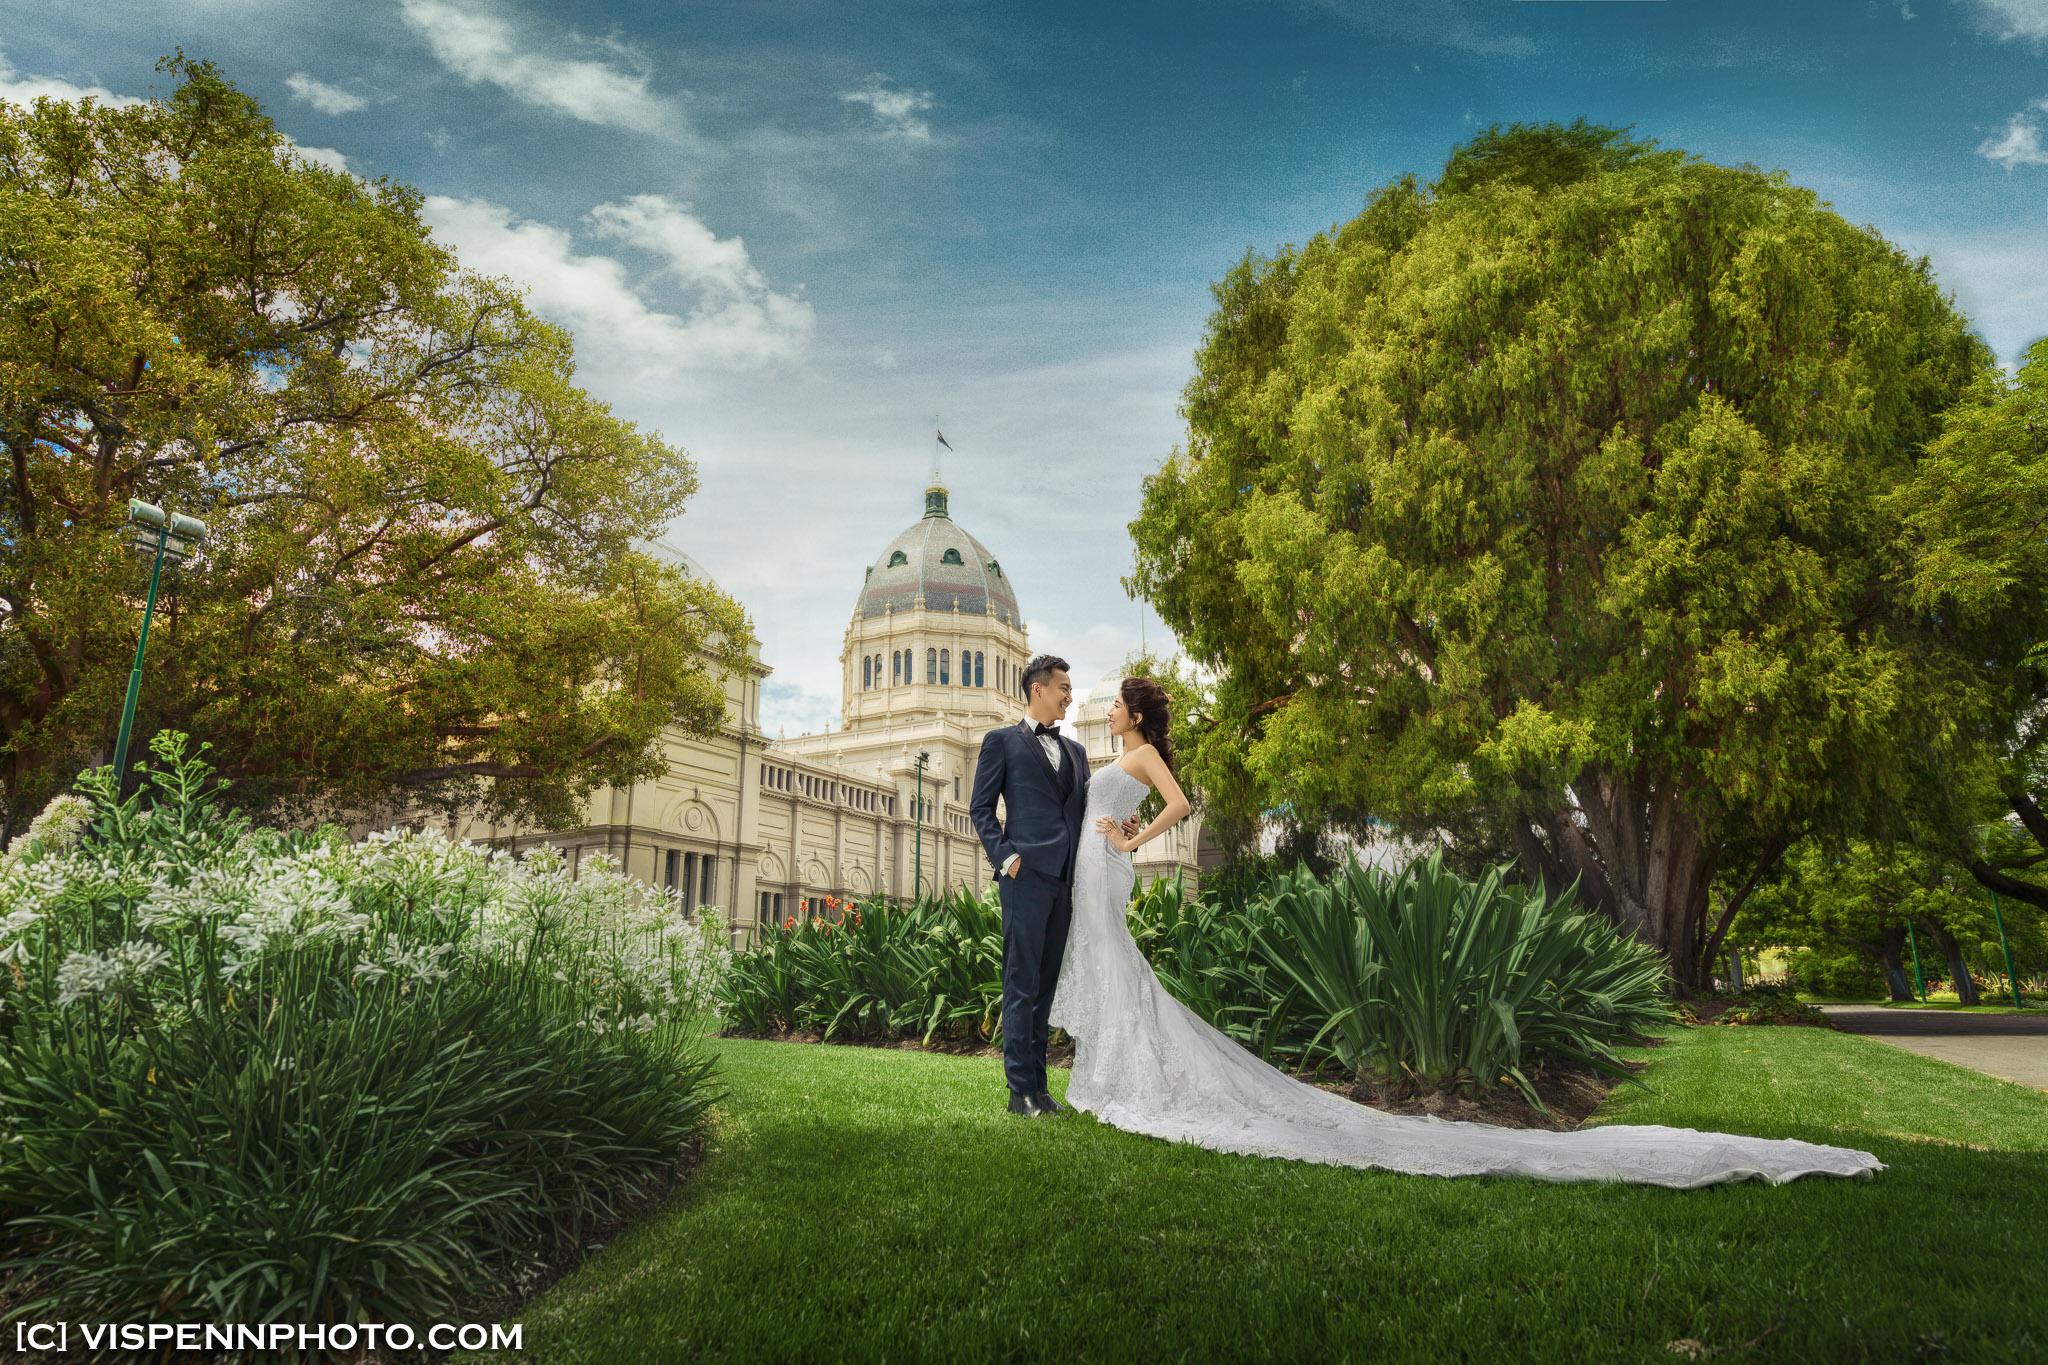 PRE WEDDING Photography Melbourne VISPENN 墨尔本 婚纱照 结婚照 婚纱摄影 VISPENN Kwok P1 0551